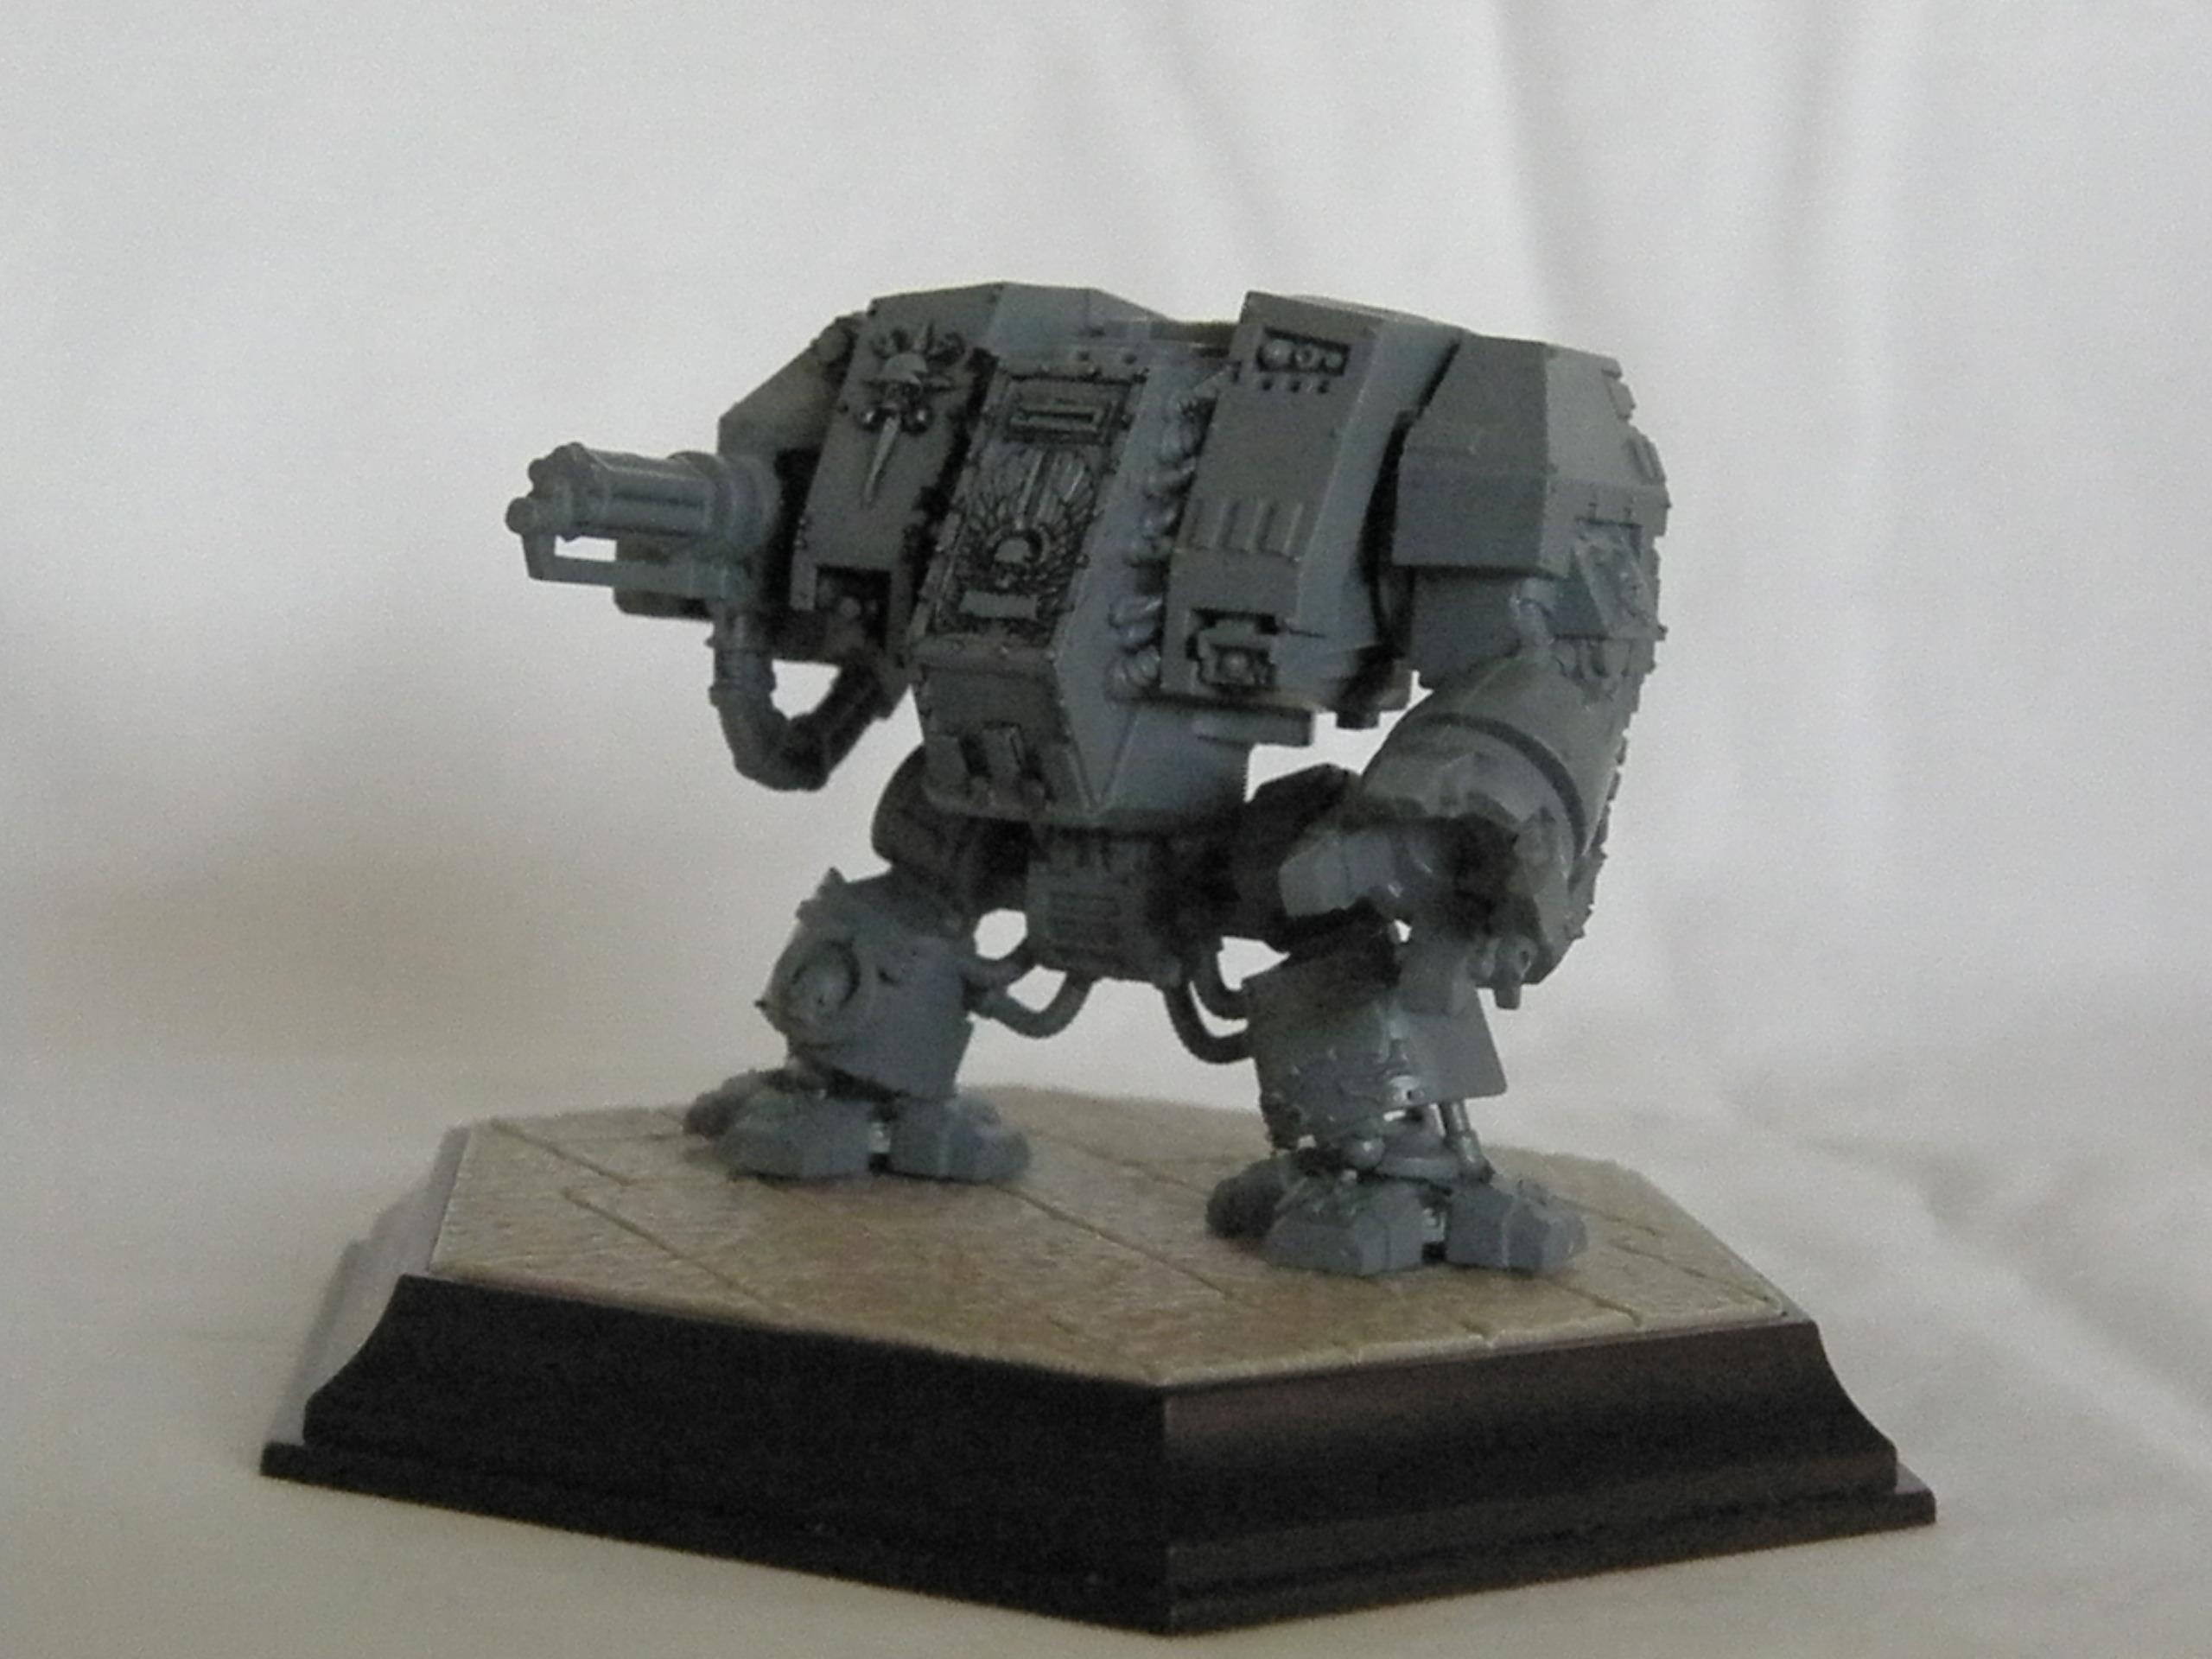 Assault Cannon, Base, Conversion, Dread Nought, Dreadnought, Unpainted, Work In Progress